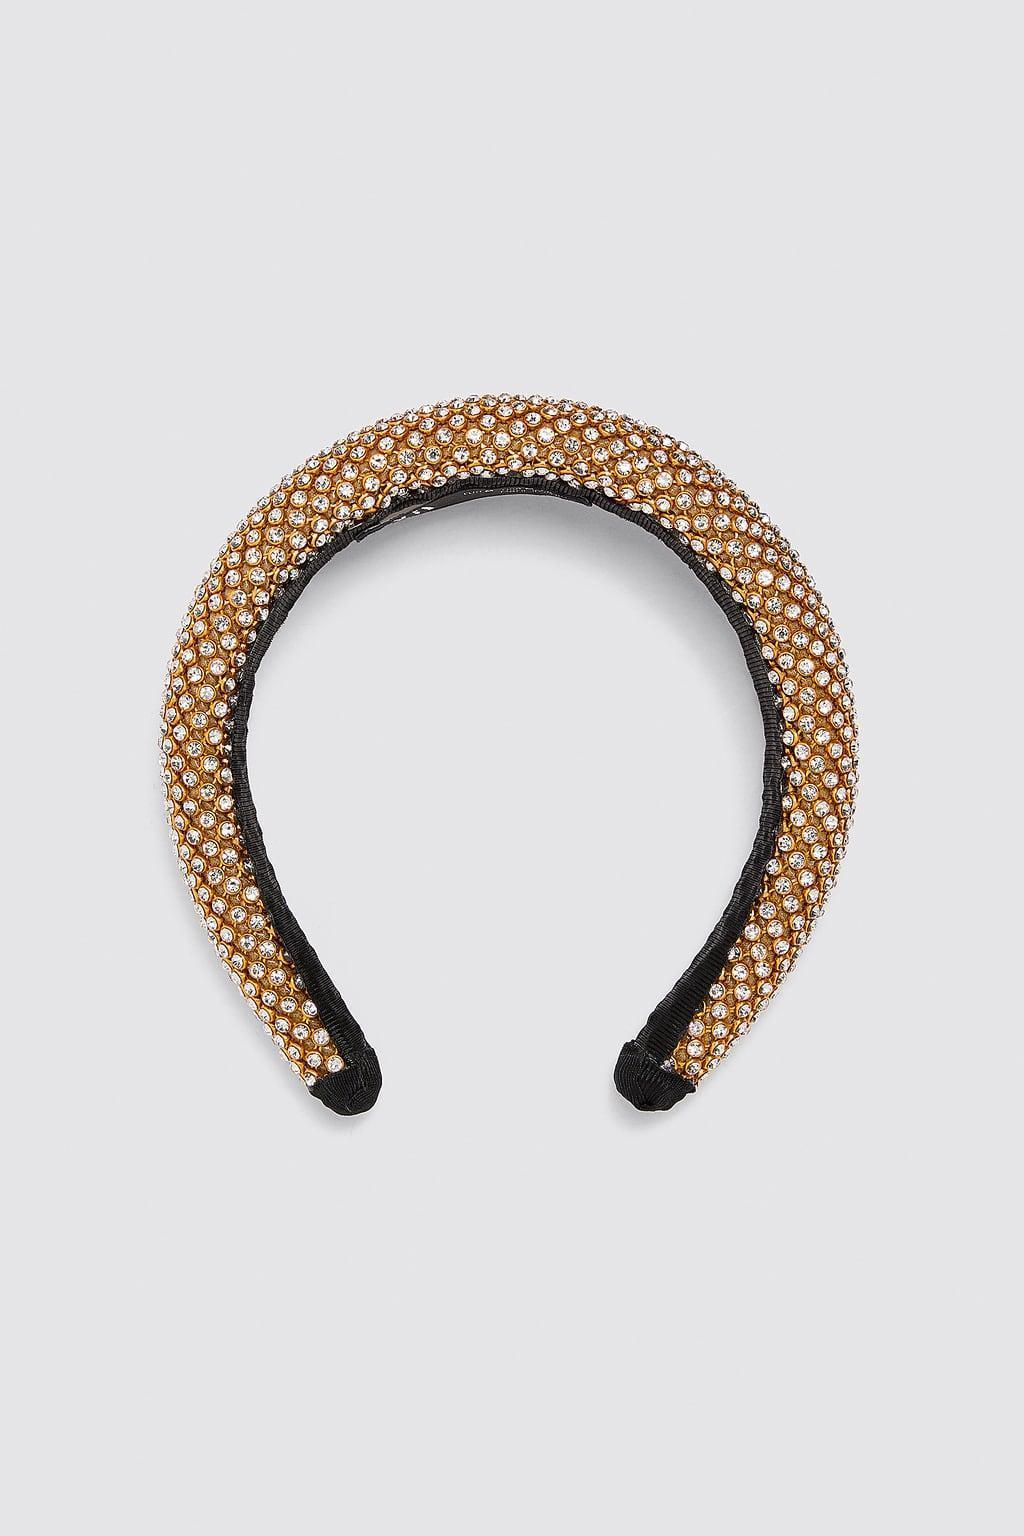 Отзыв на PADDED RHINESTONE HEADBAND из Интернет-Магазина Zara